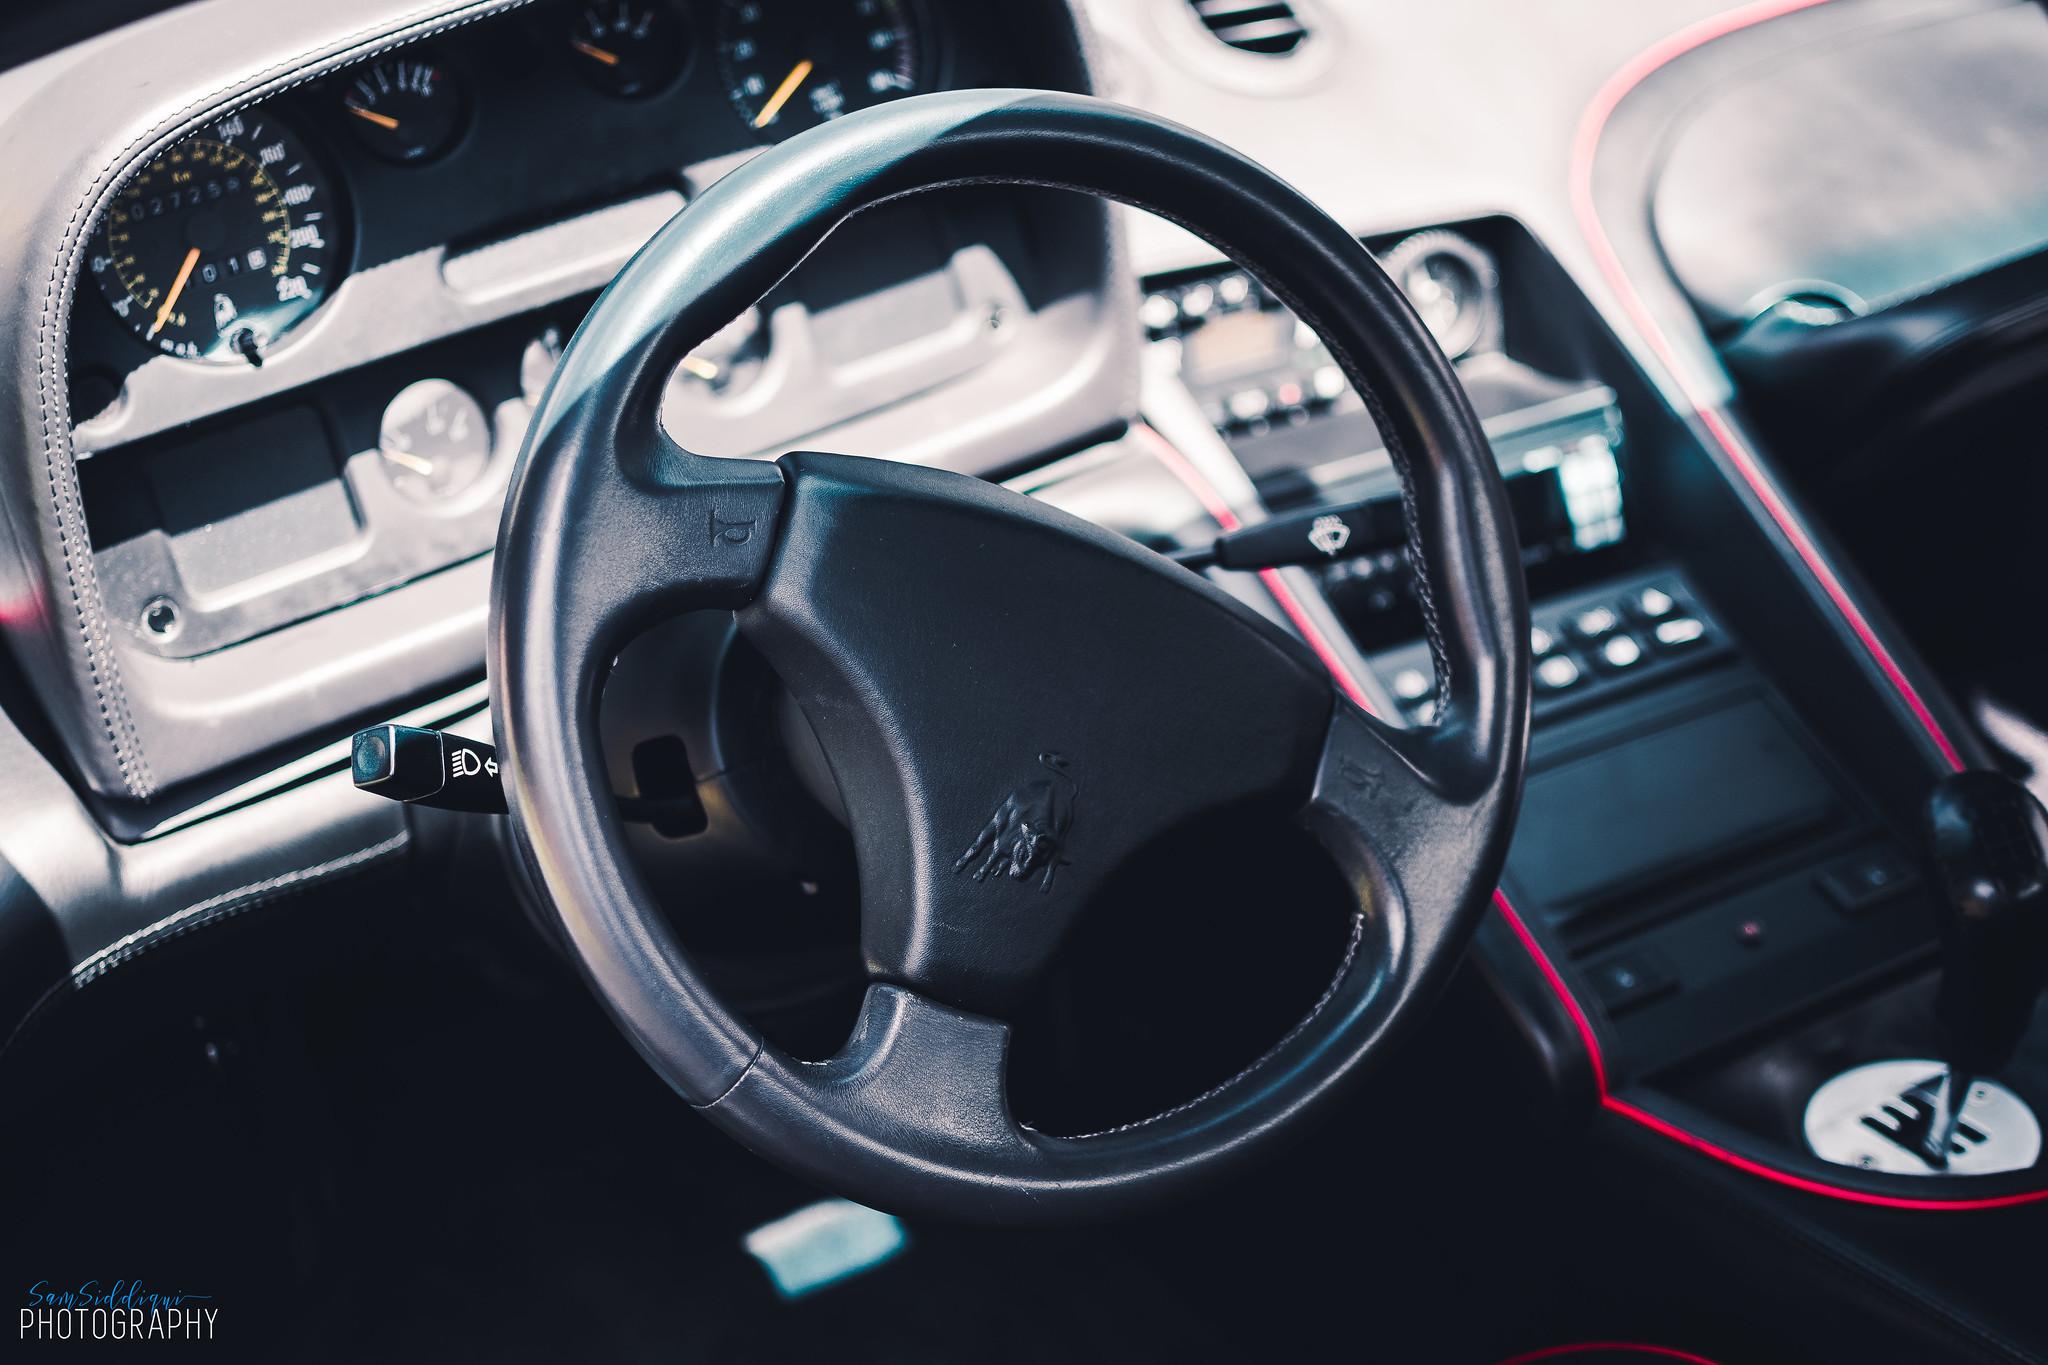 1991 White Lamborghini Diablo Steering